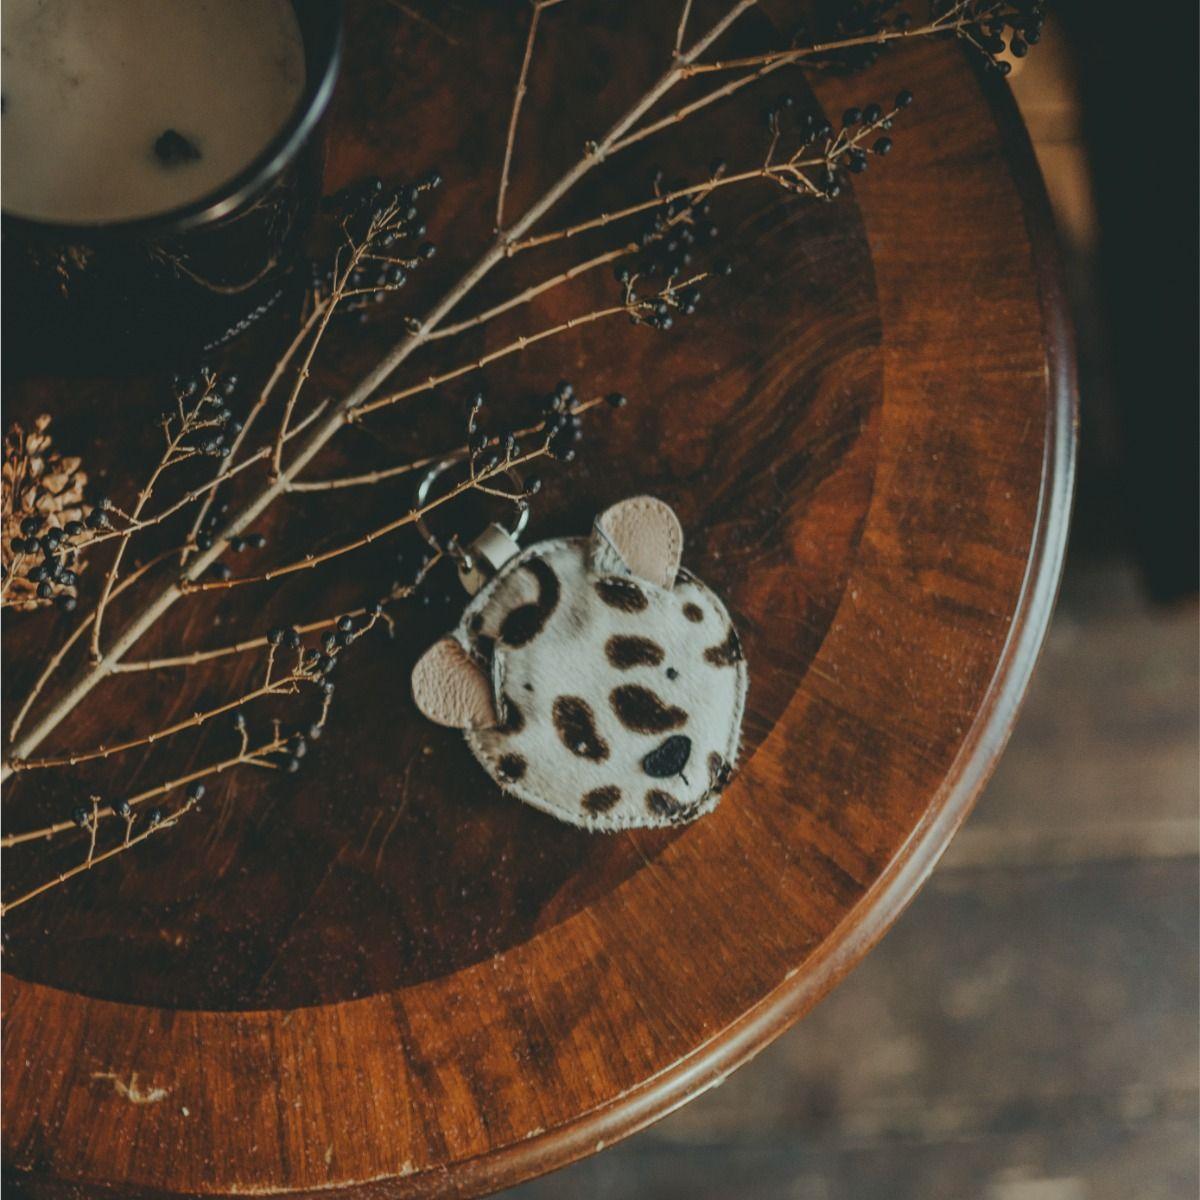 Wookie Exclusive Chain | Snow Leopard